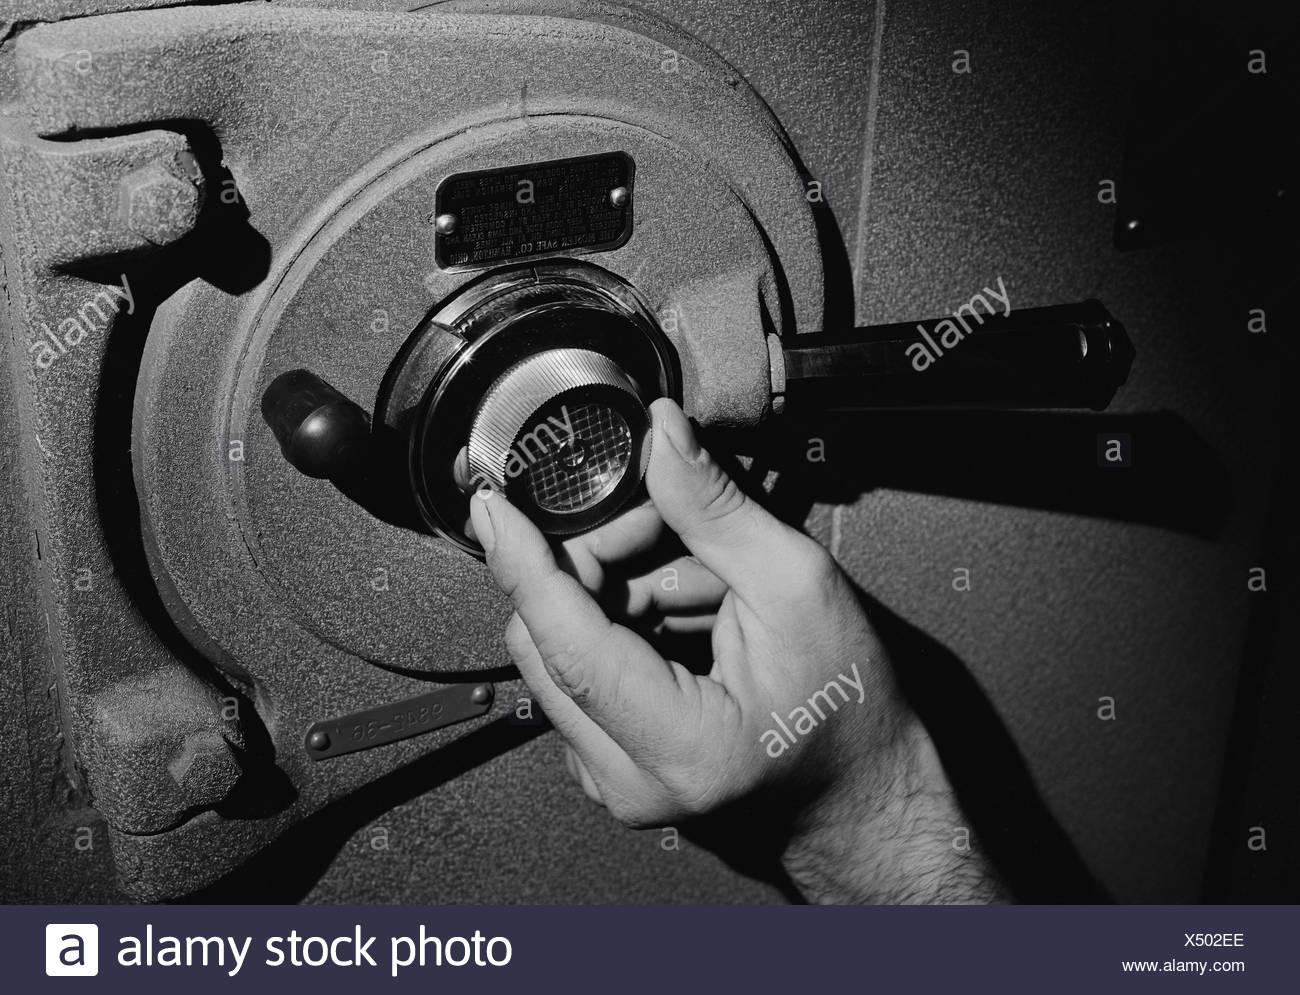 Mans hand unlocking safe - Stock Image